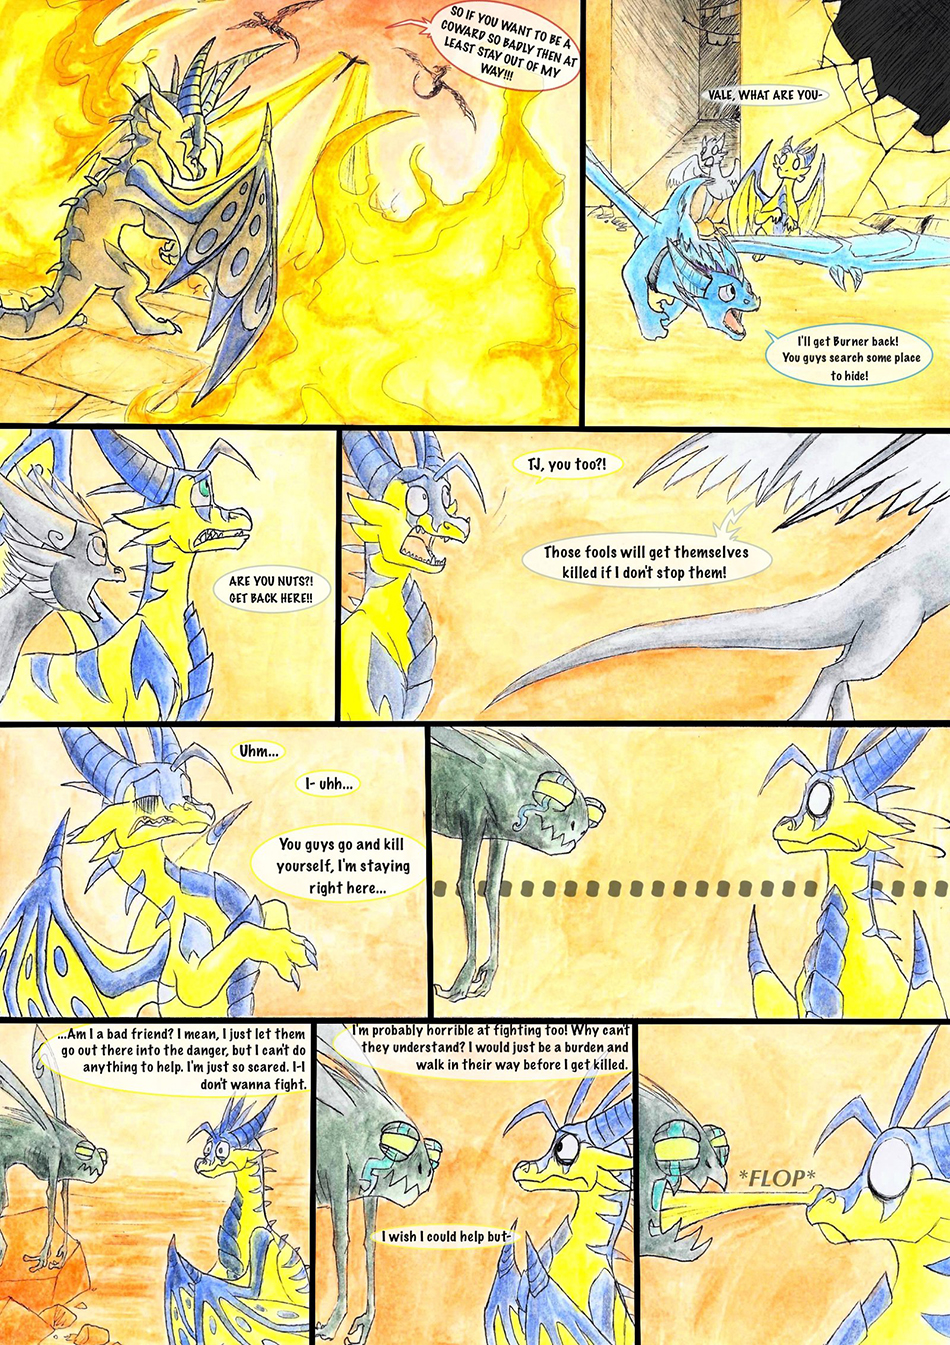 Facing reality - page 7